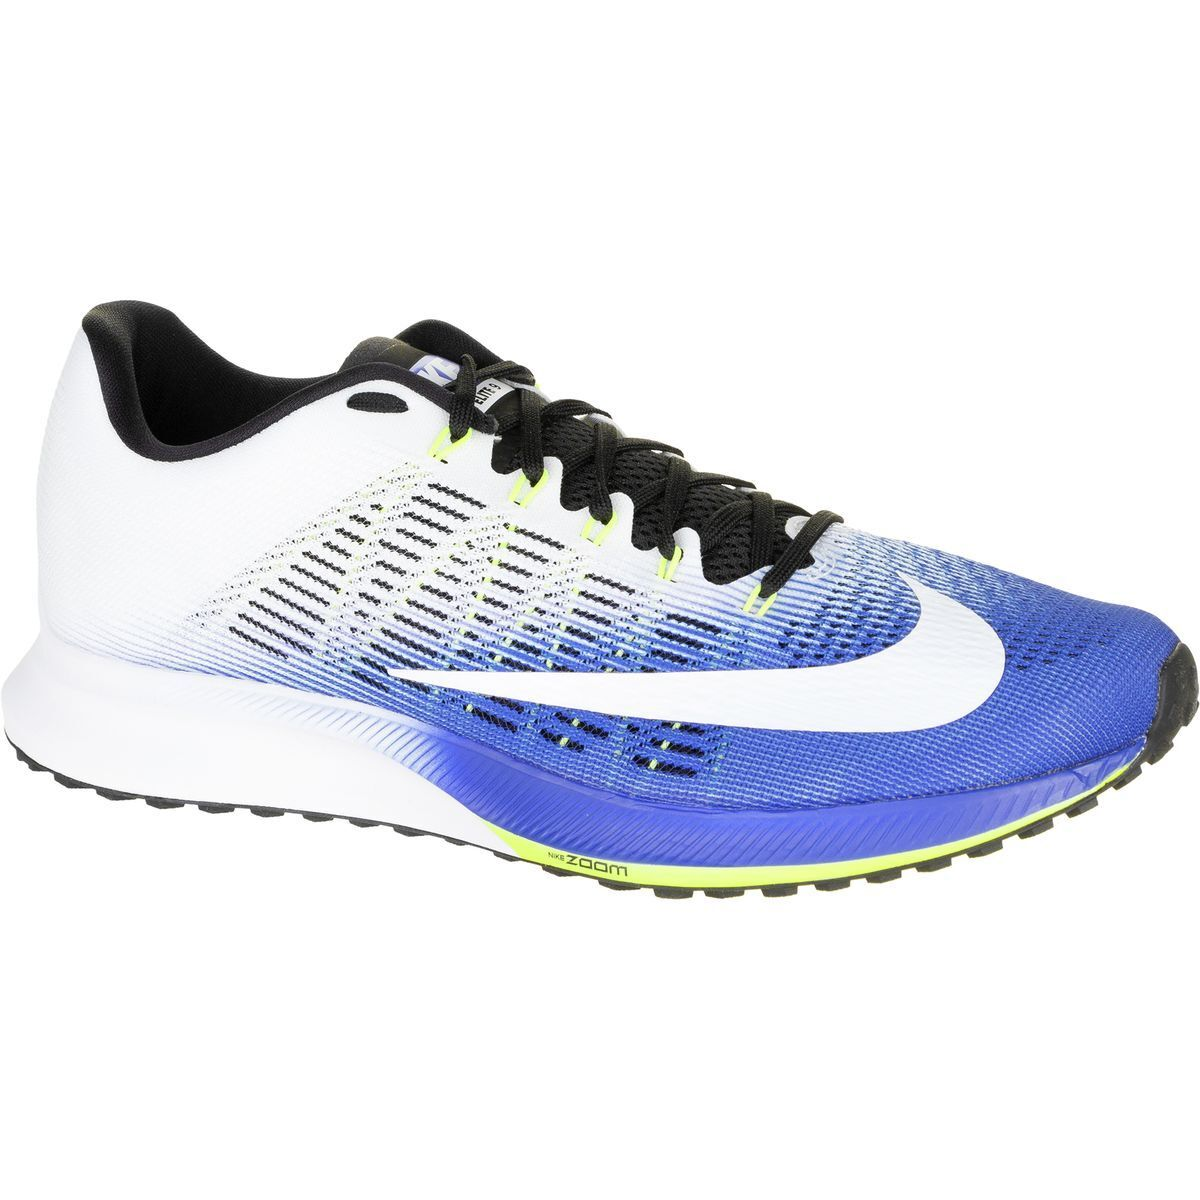 Nike Air Zoom Elite 9 IX Blue White Volt Men Running Shoes Sneakers 863769-400